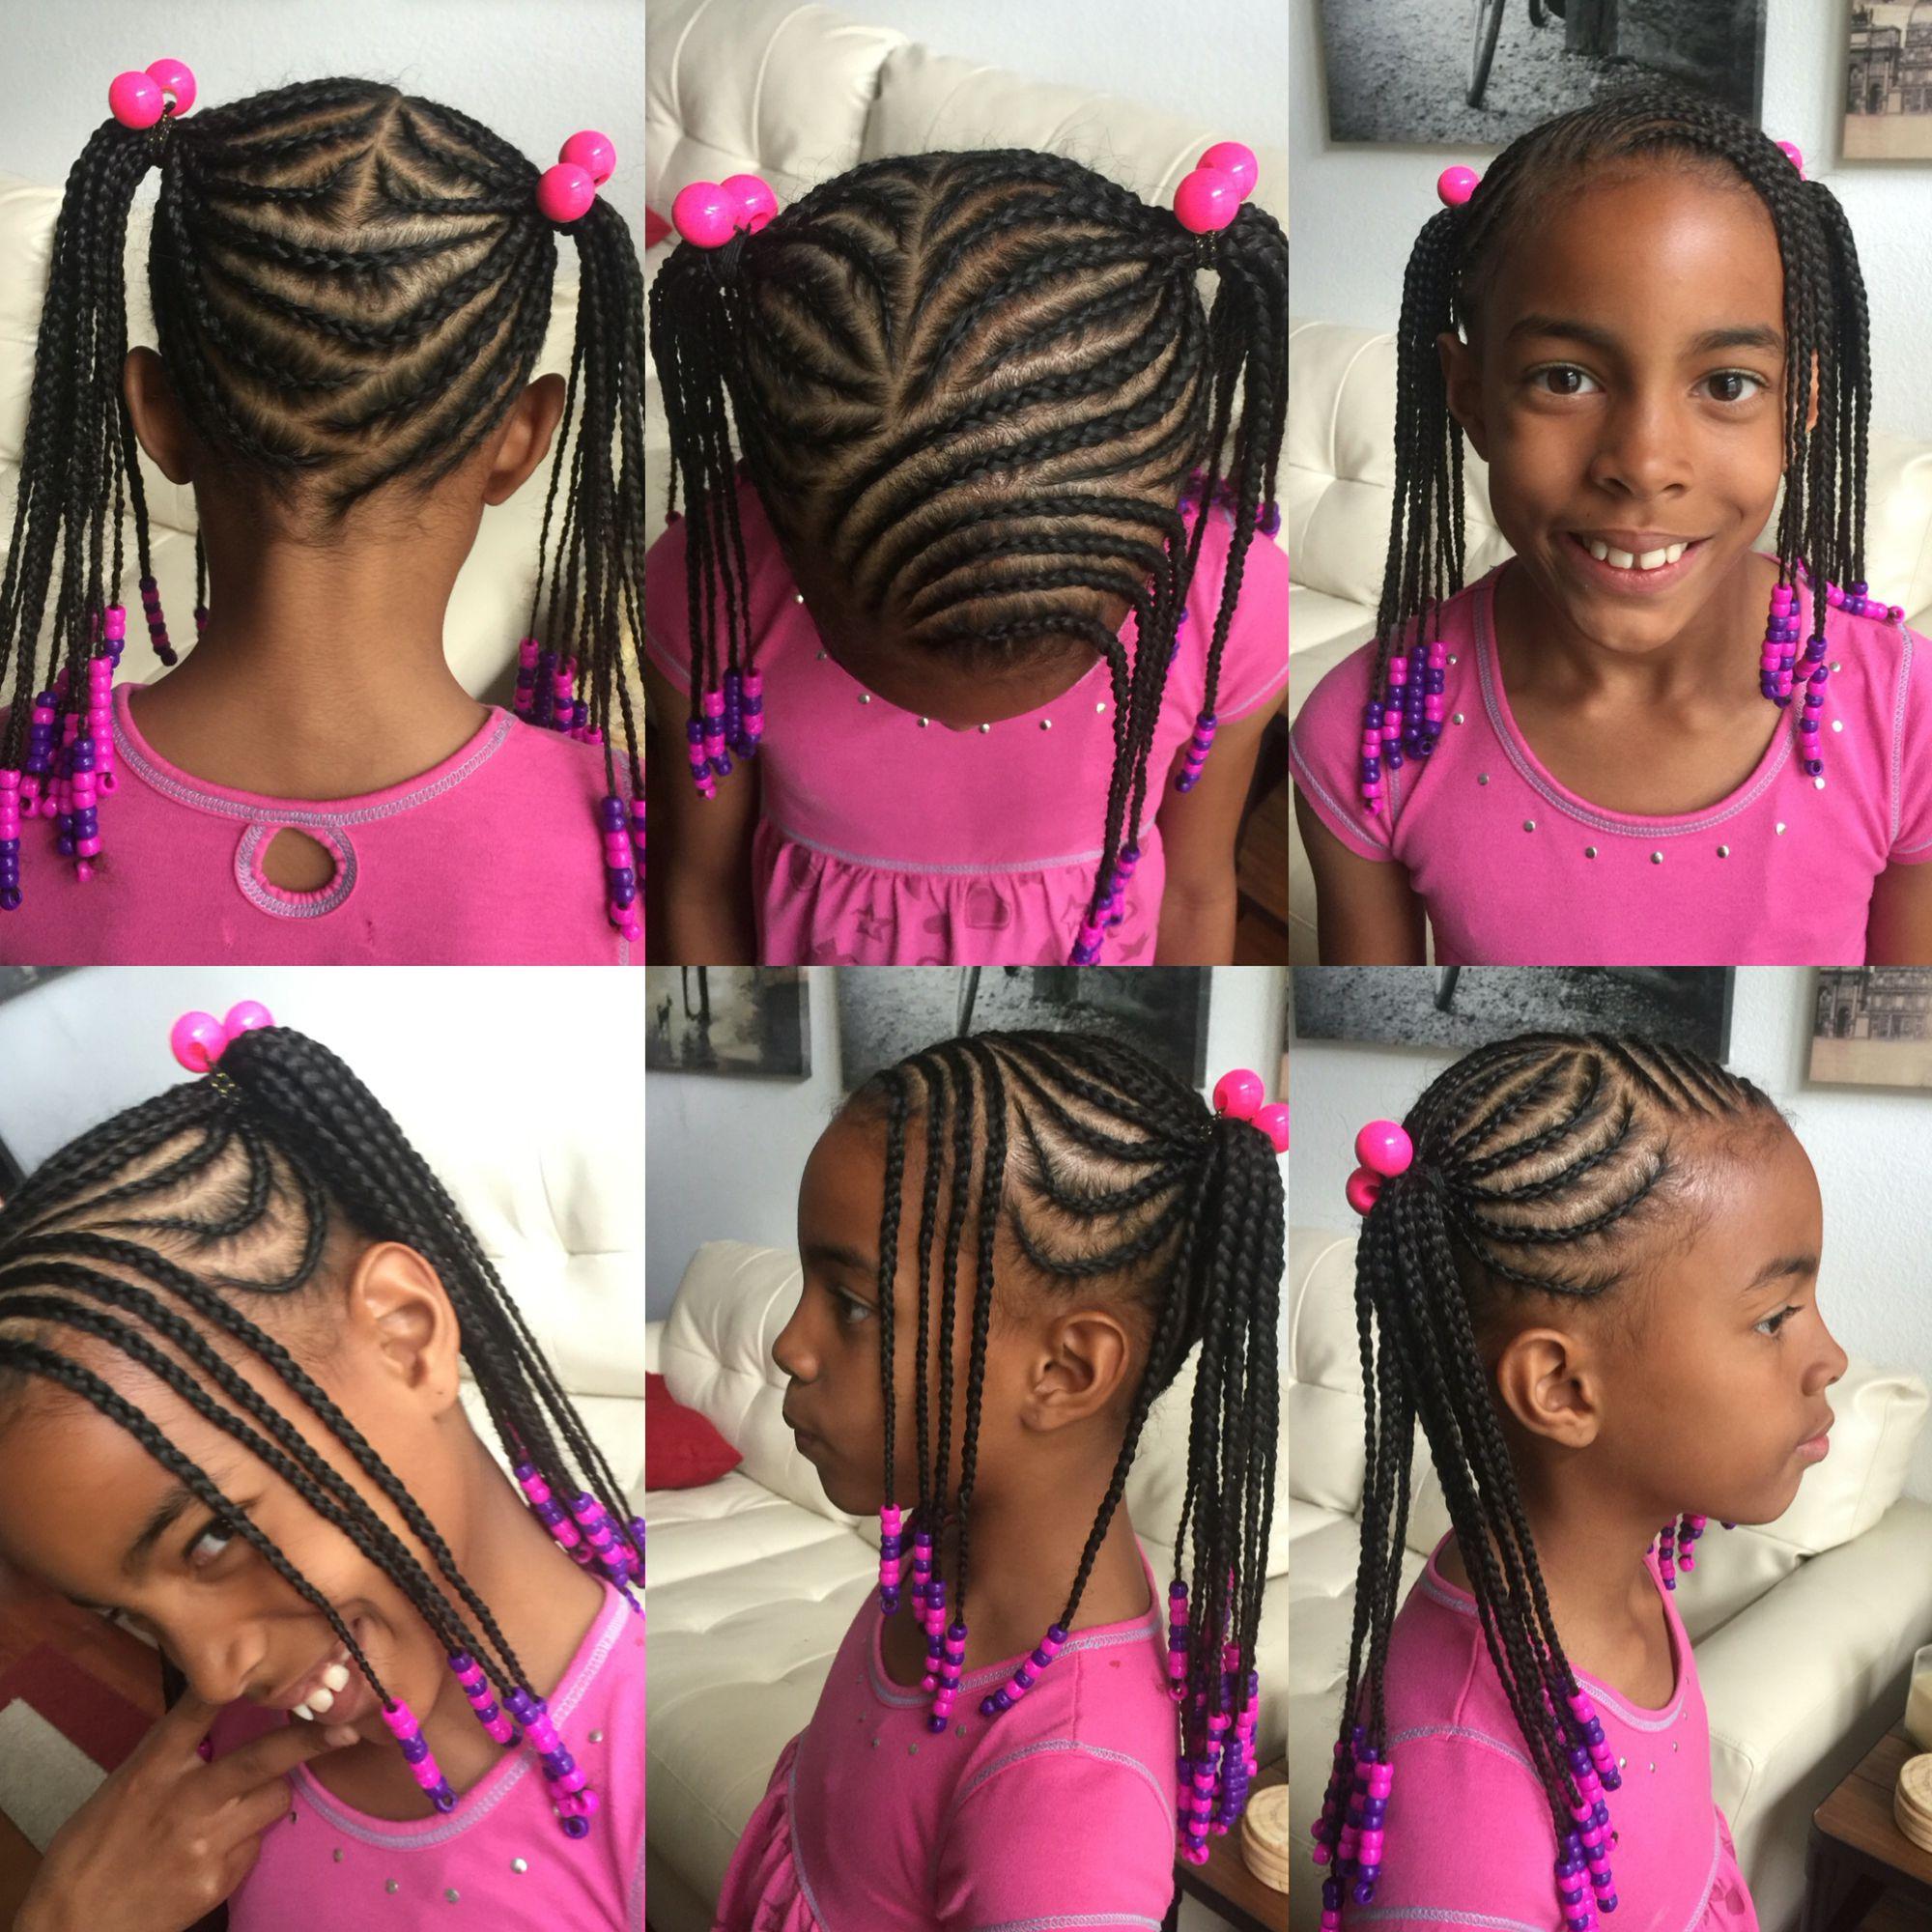 Pin On Hair Inside Favorite Beaded Bangs Braided Hairstyles (View 5 of 20)